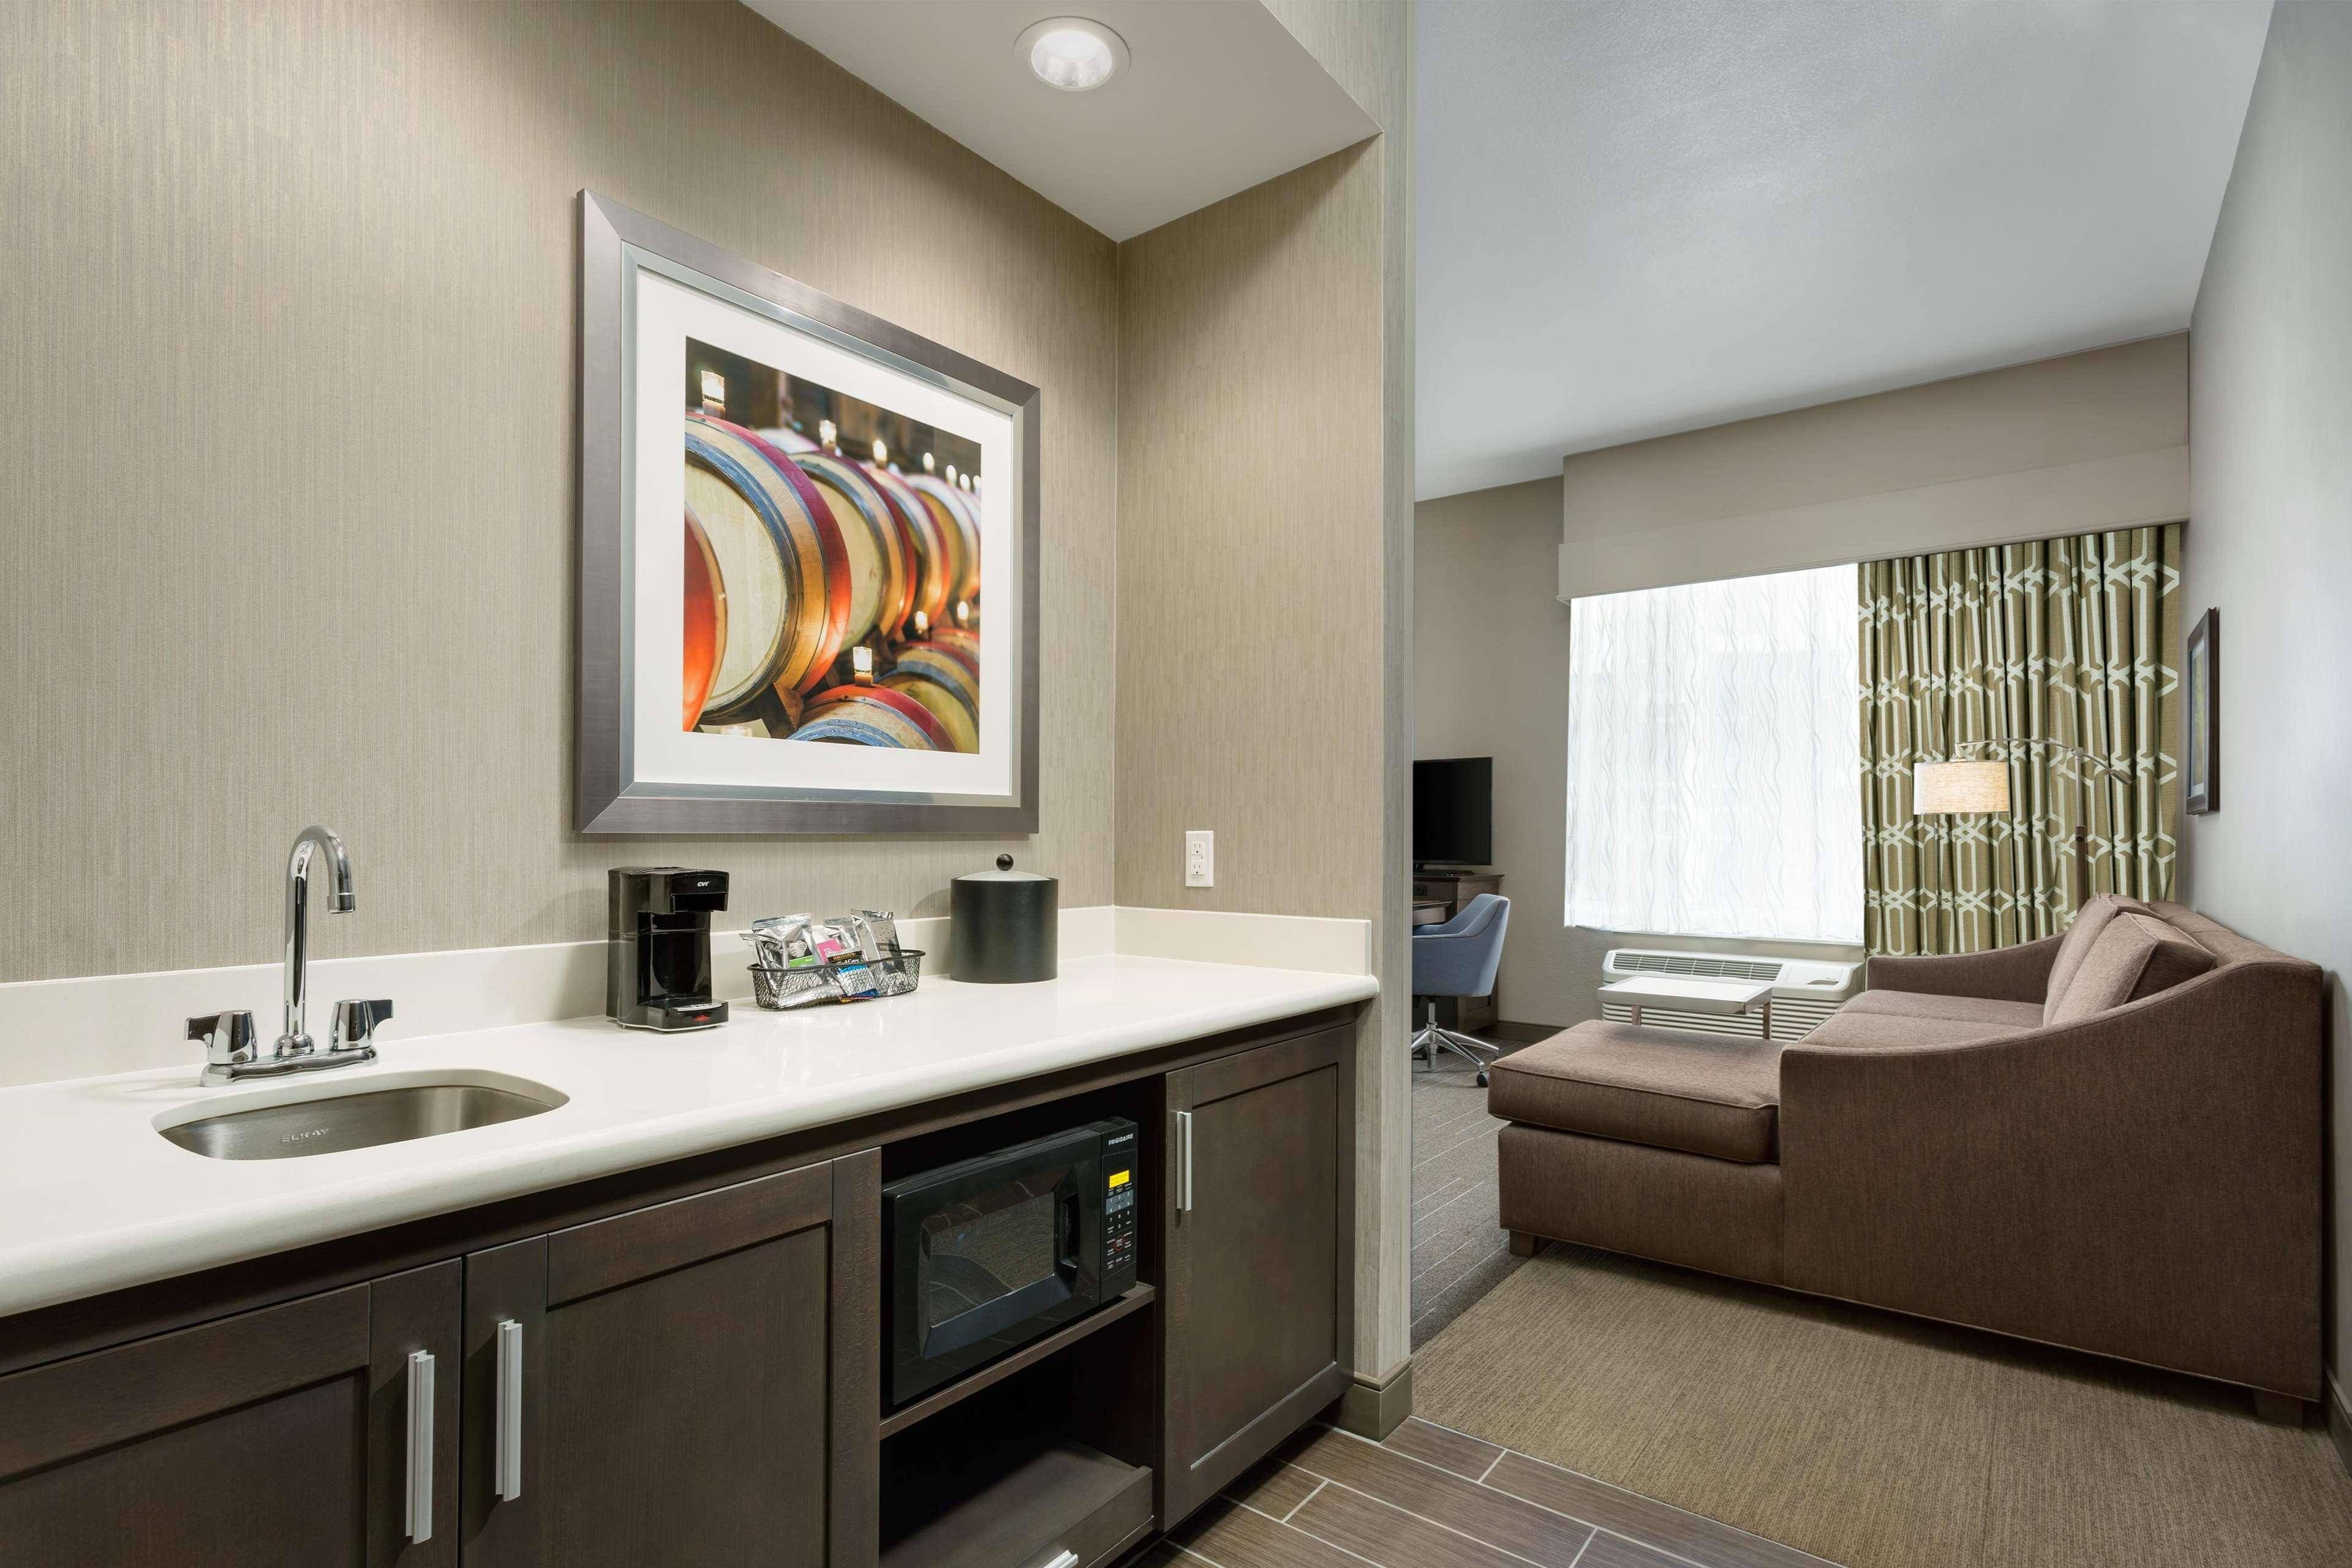 Hampton Inn & Suites Napa image 5